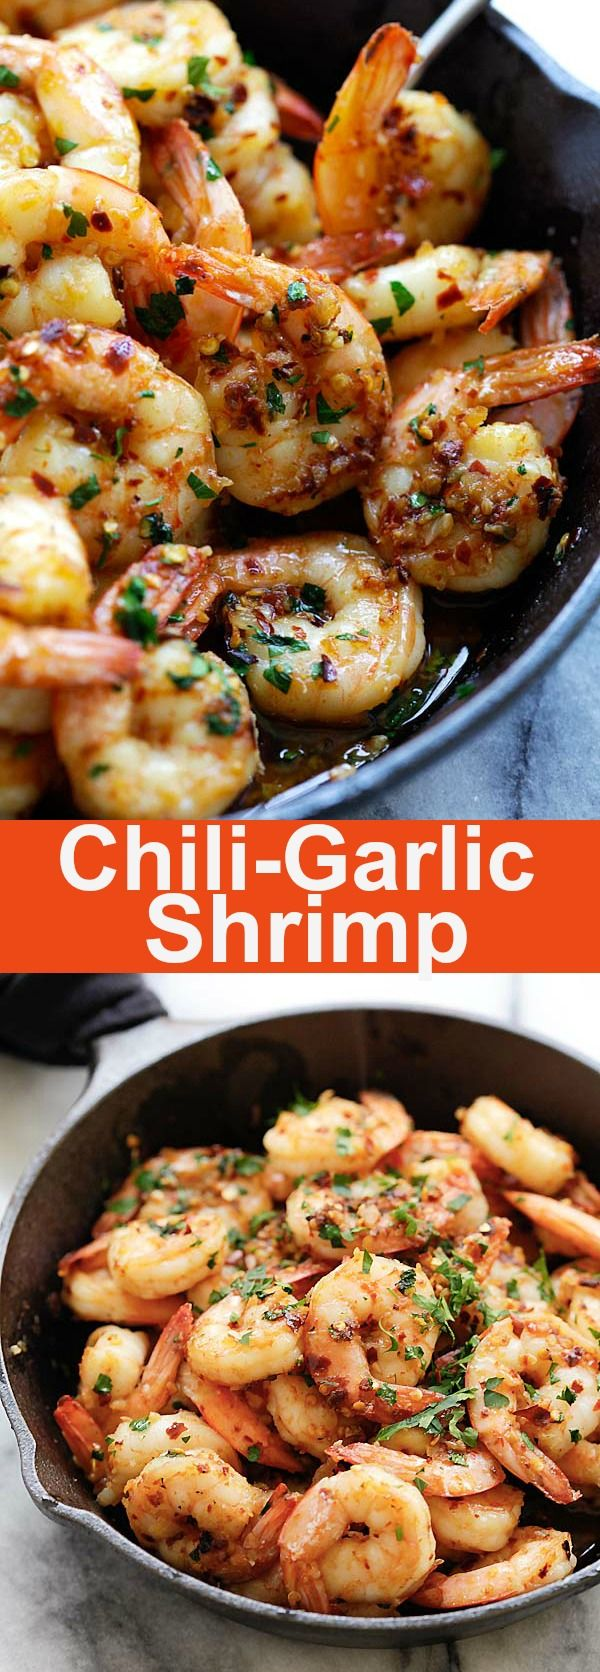 Chili Garlic Shrimp (Gambas Al Ajillo) – the best shrimp appetizer recipe you'll make. This Spanish chili garlic shrimp recipe is the bomb   rasamalaysia.com